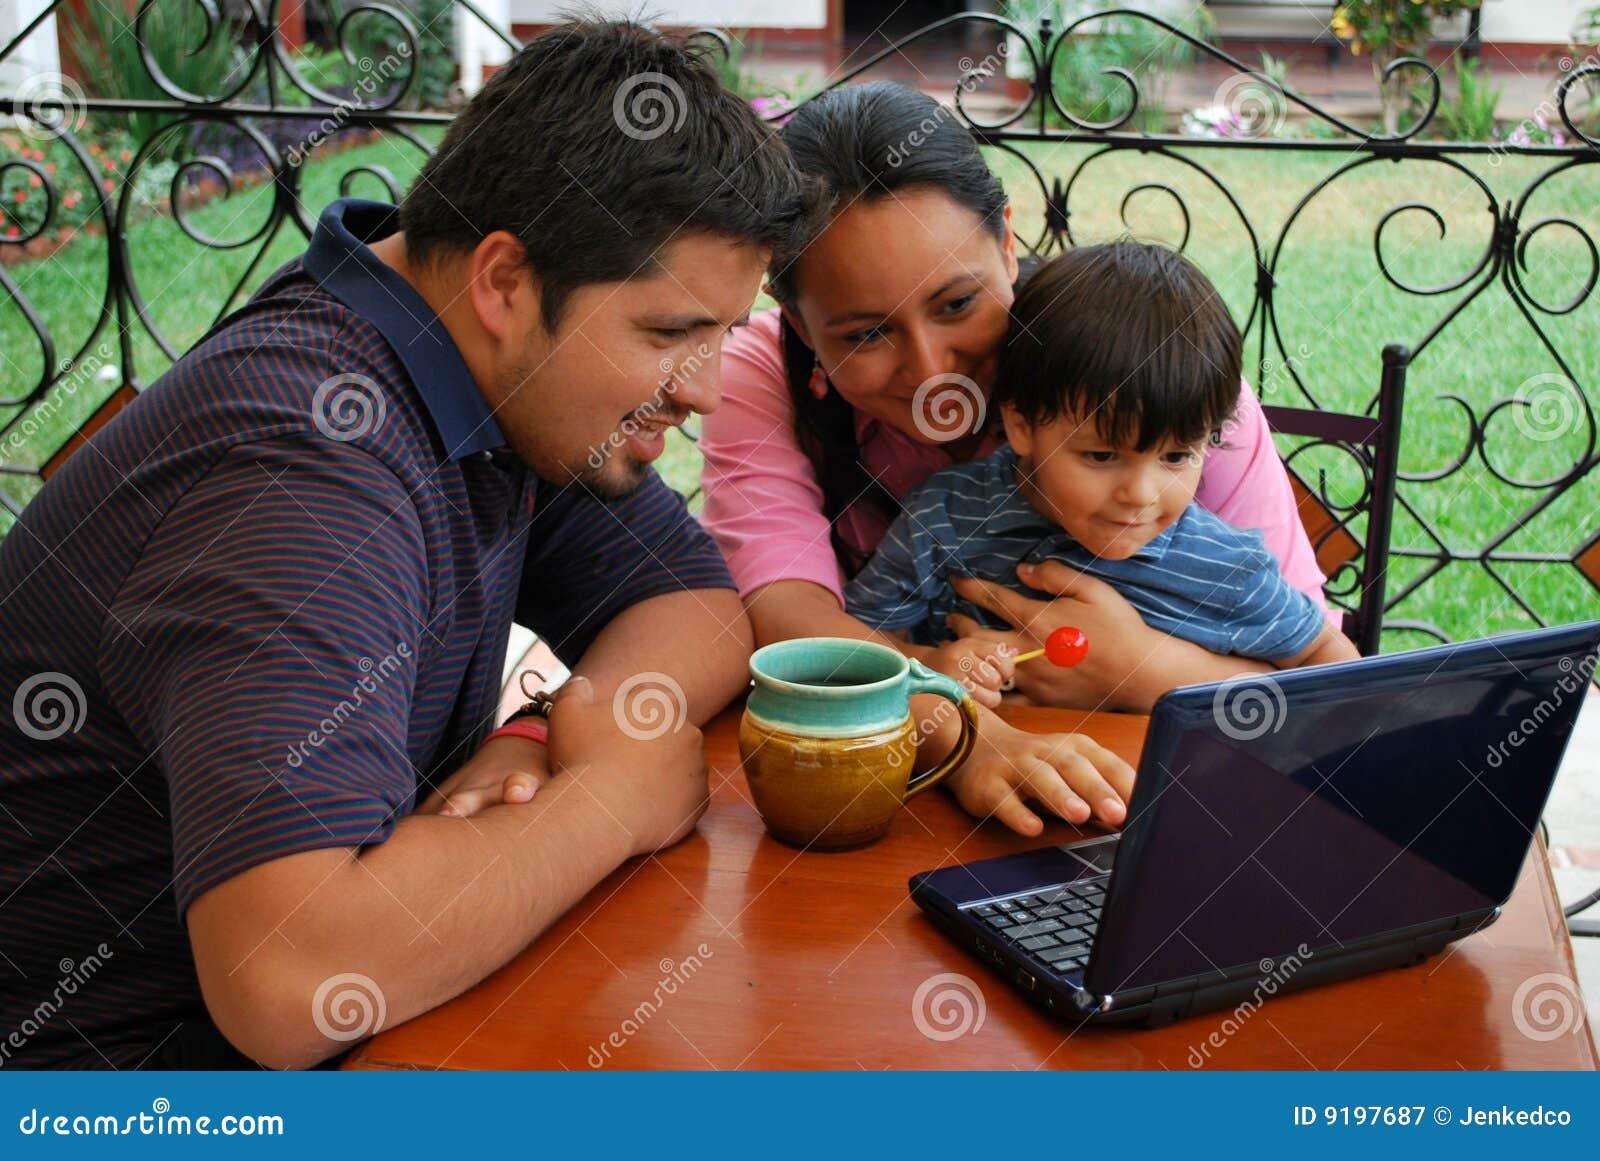 Hispanic family using a computer